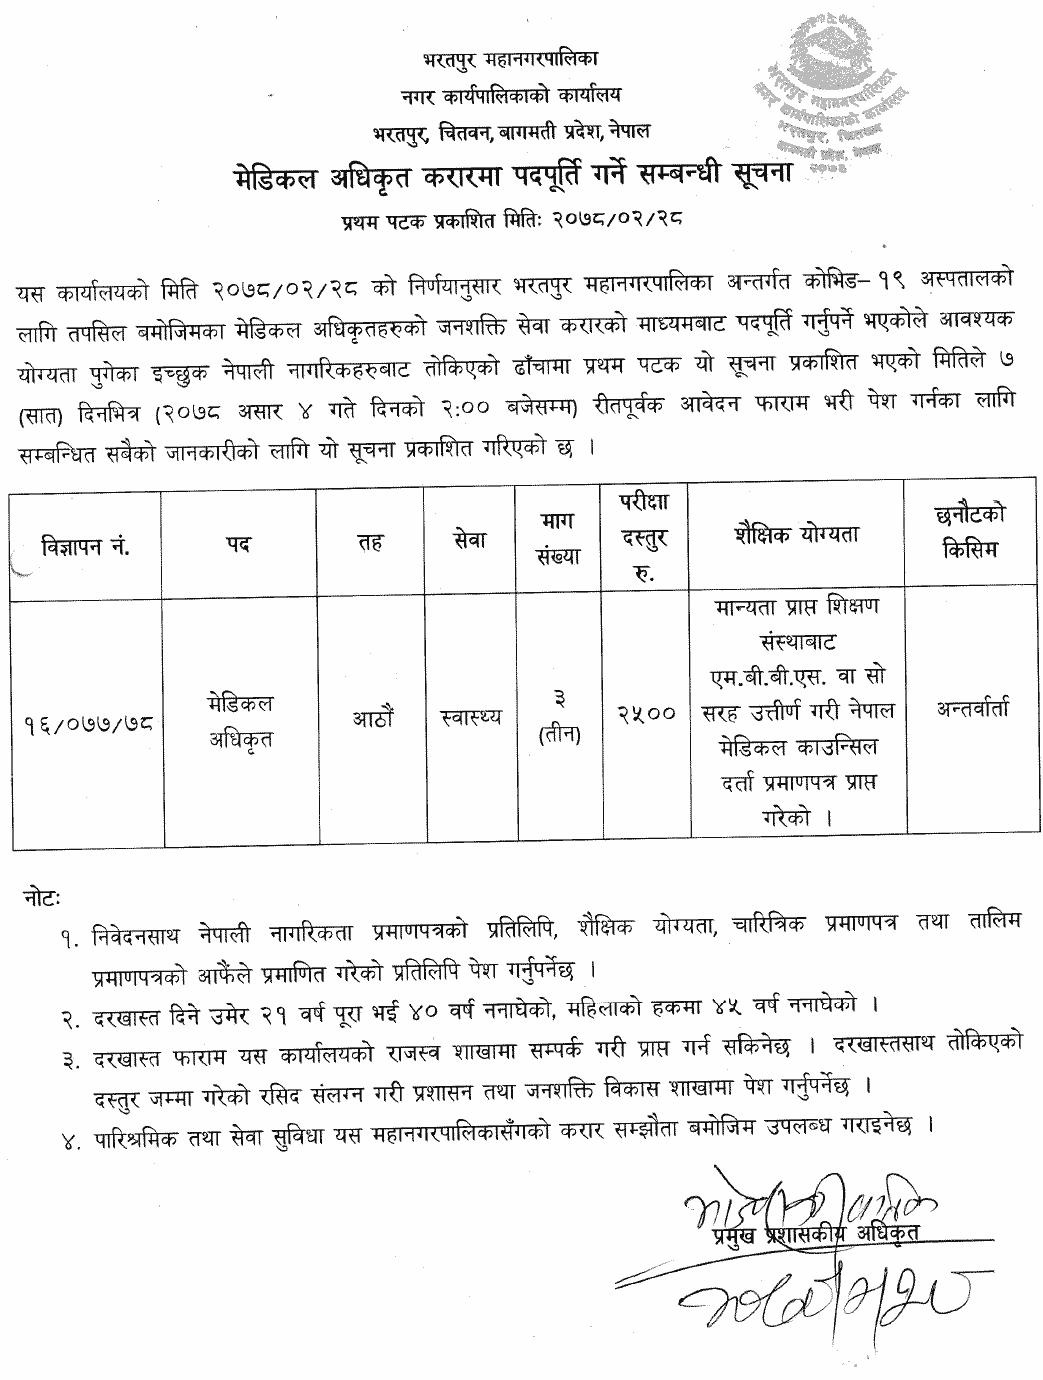 Bharatpur-Metropolitan-City-Job-Vacancy-for-Medical-Officer